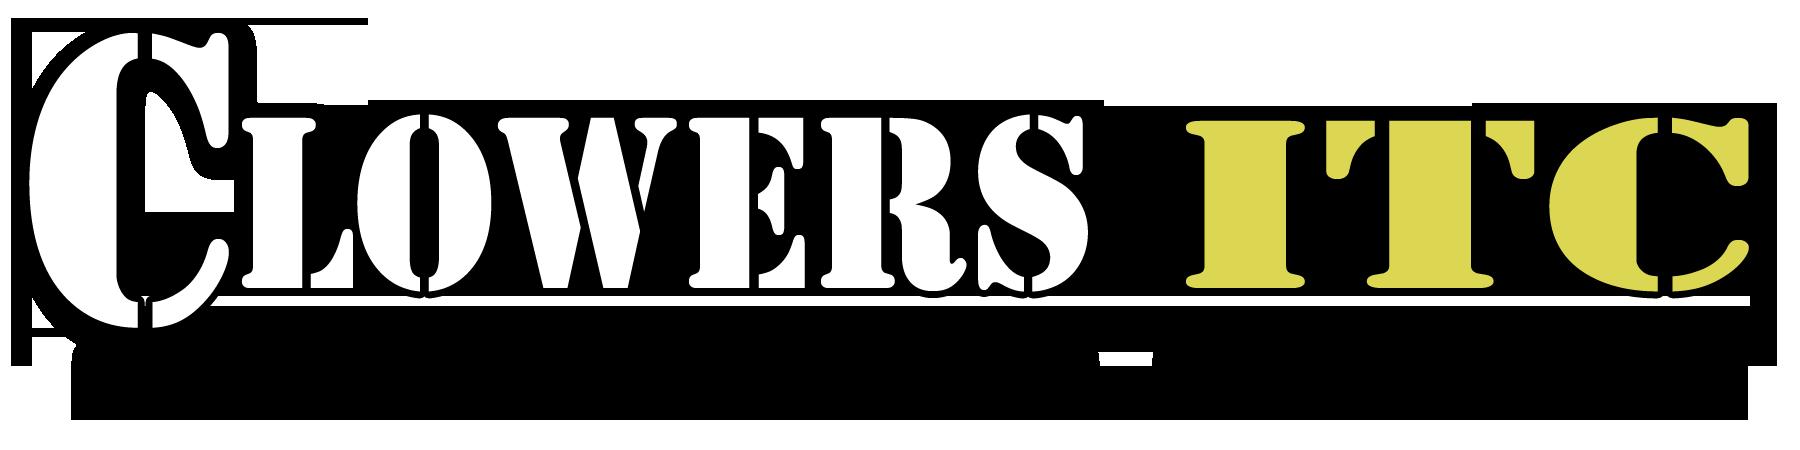 clowers logo flatten.png